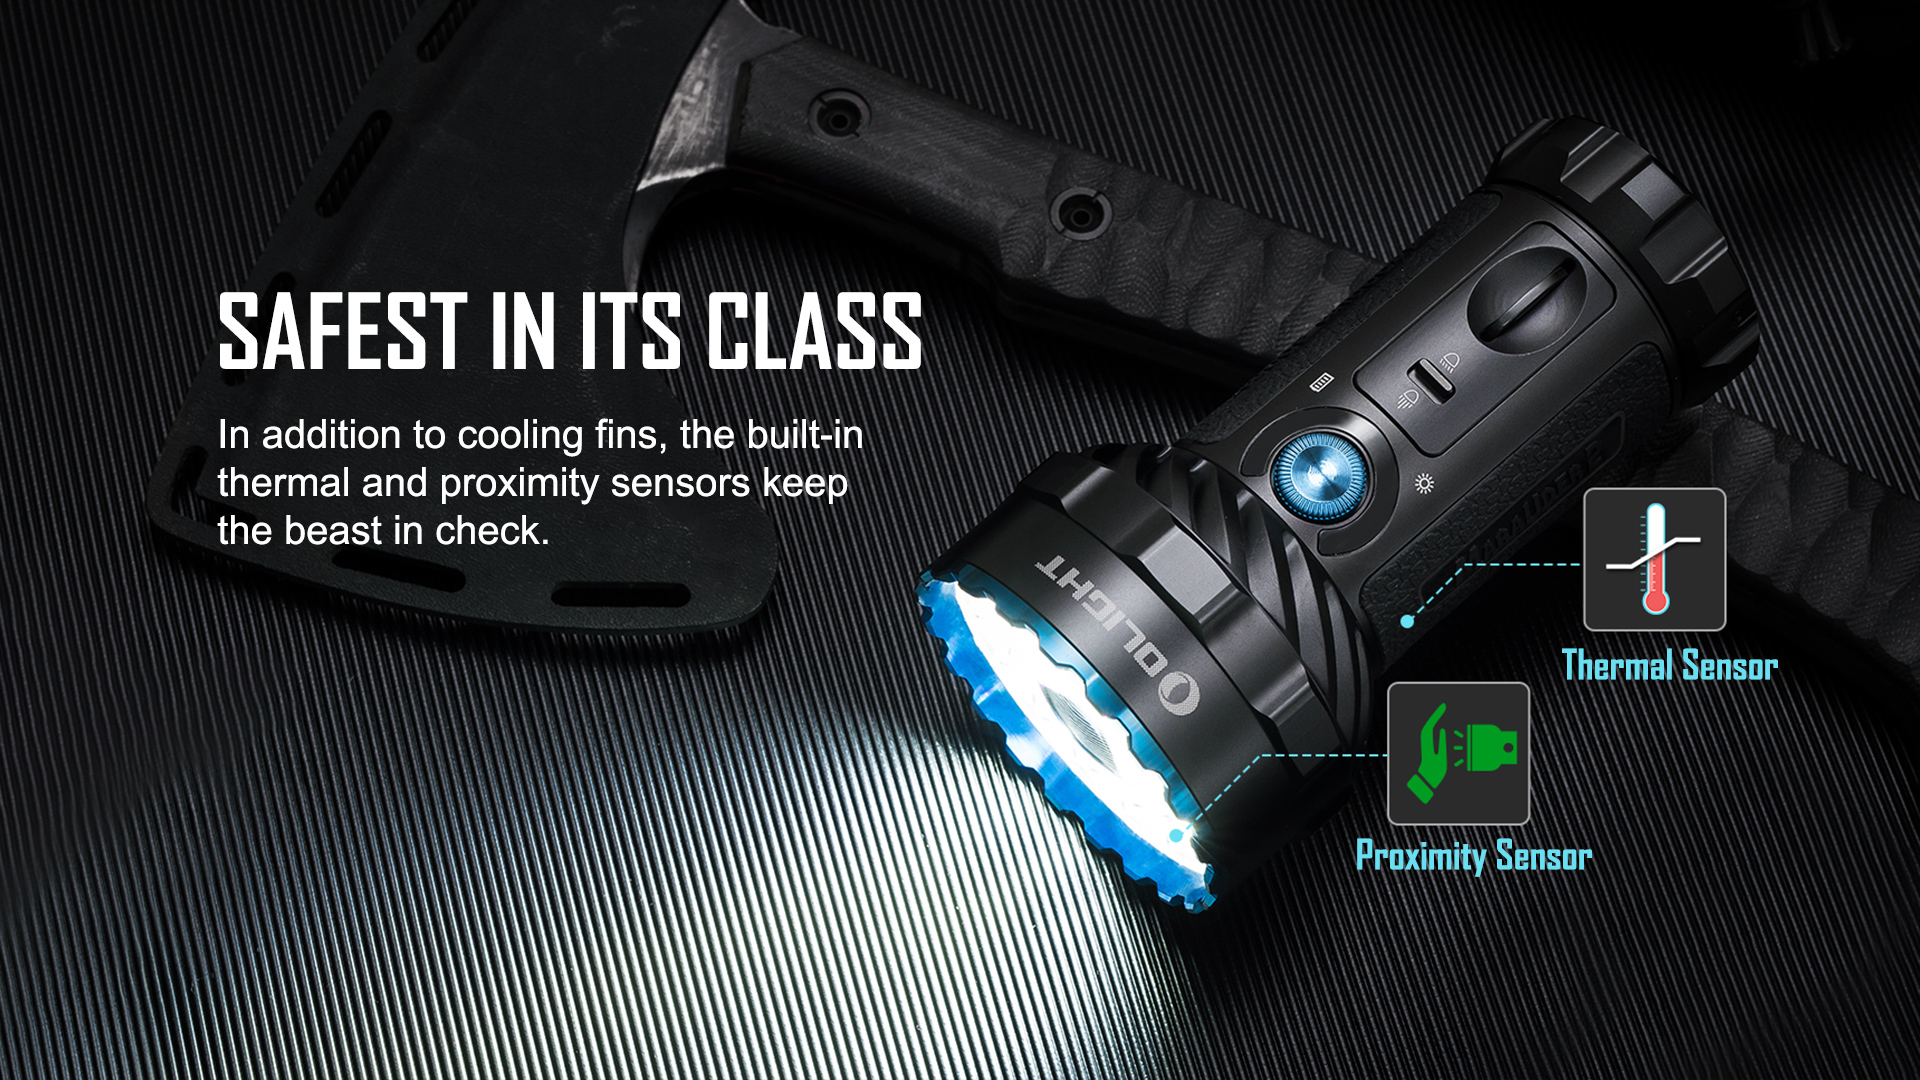 Olight Marauder 2 Most Powerful Flashlight Safe in Class